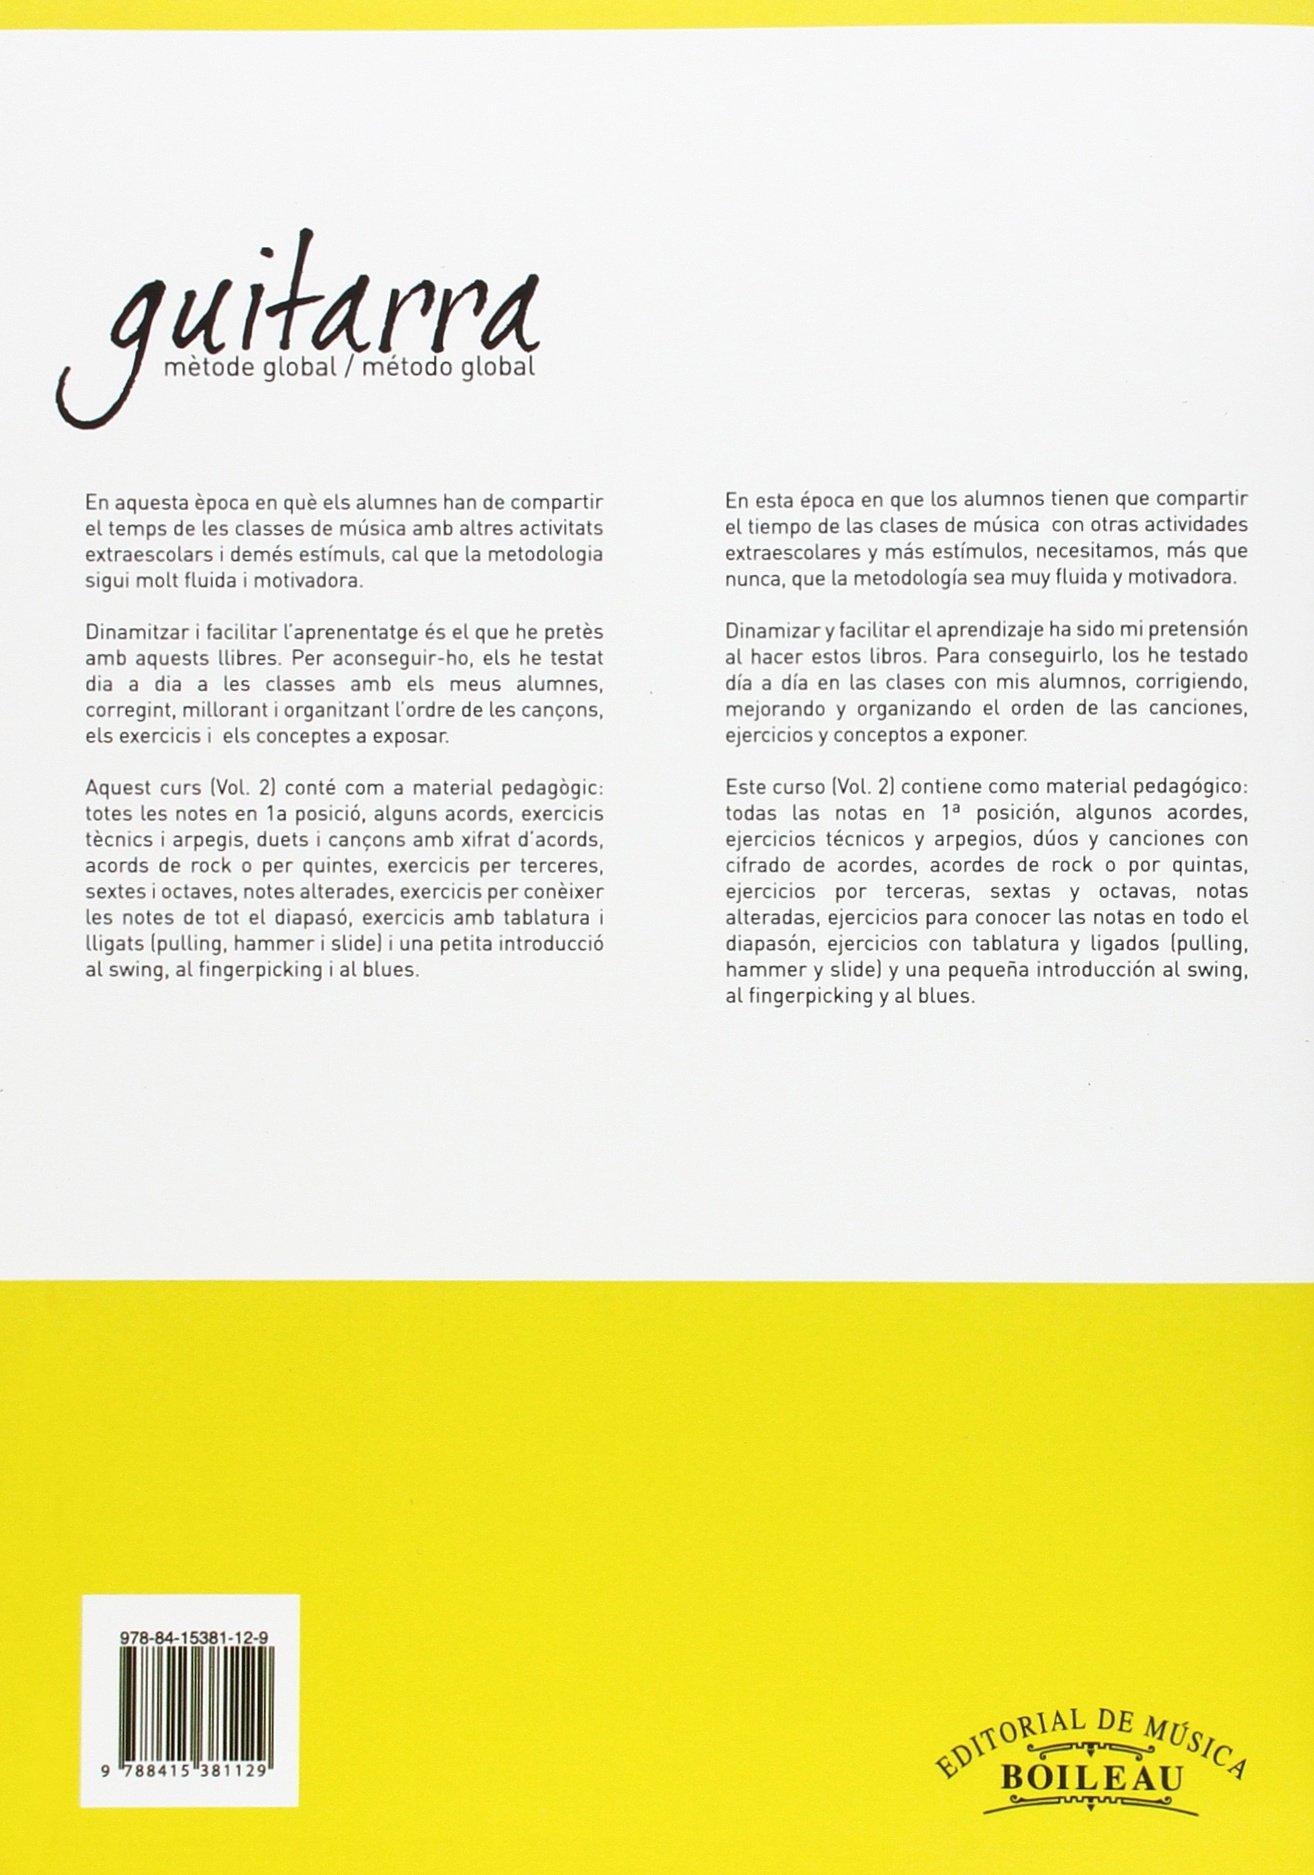 Guitarra. Mètode global. Vol. 2: Amazon.es: Murillas Muncunill ...